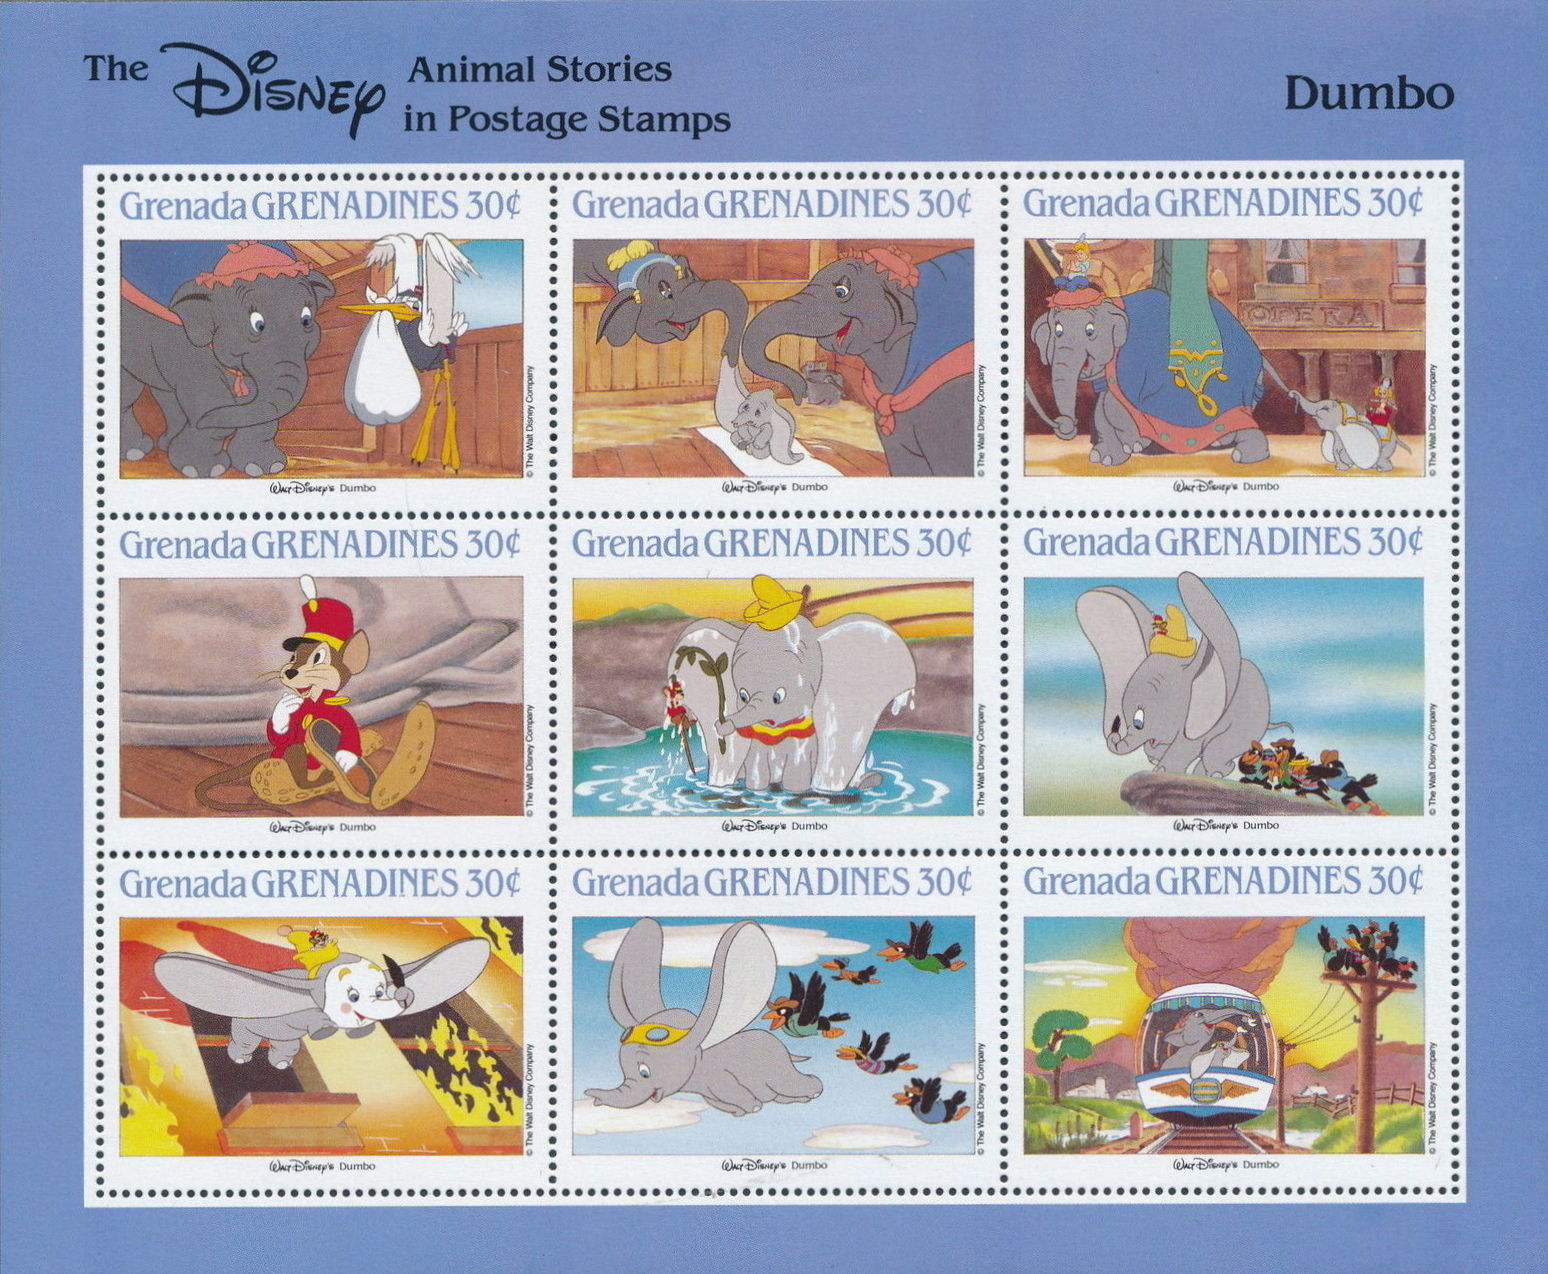 Grenada Grenadines 1988 The Disney Animal Stories in Postage Stamps SSd.jpg